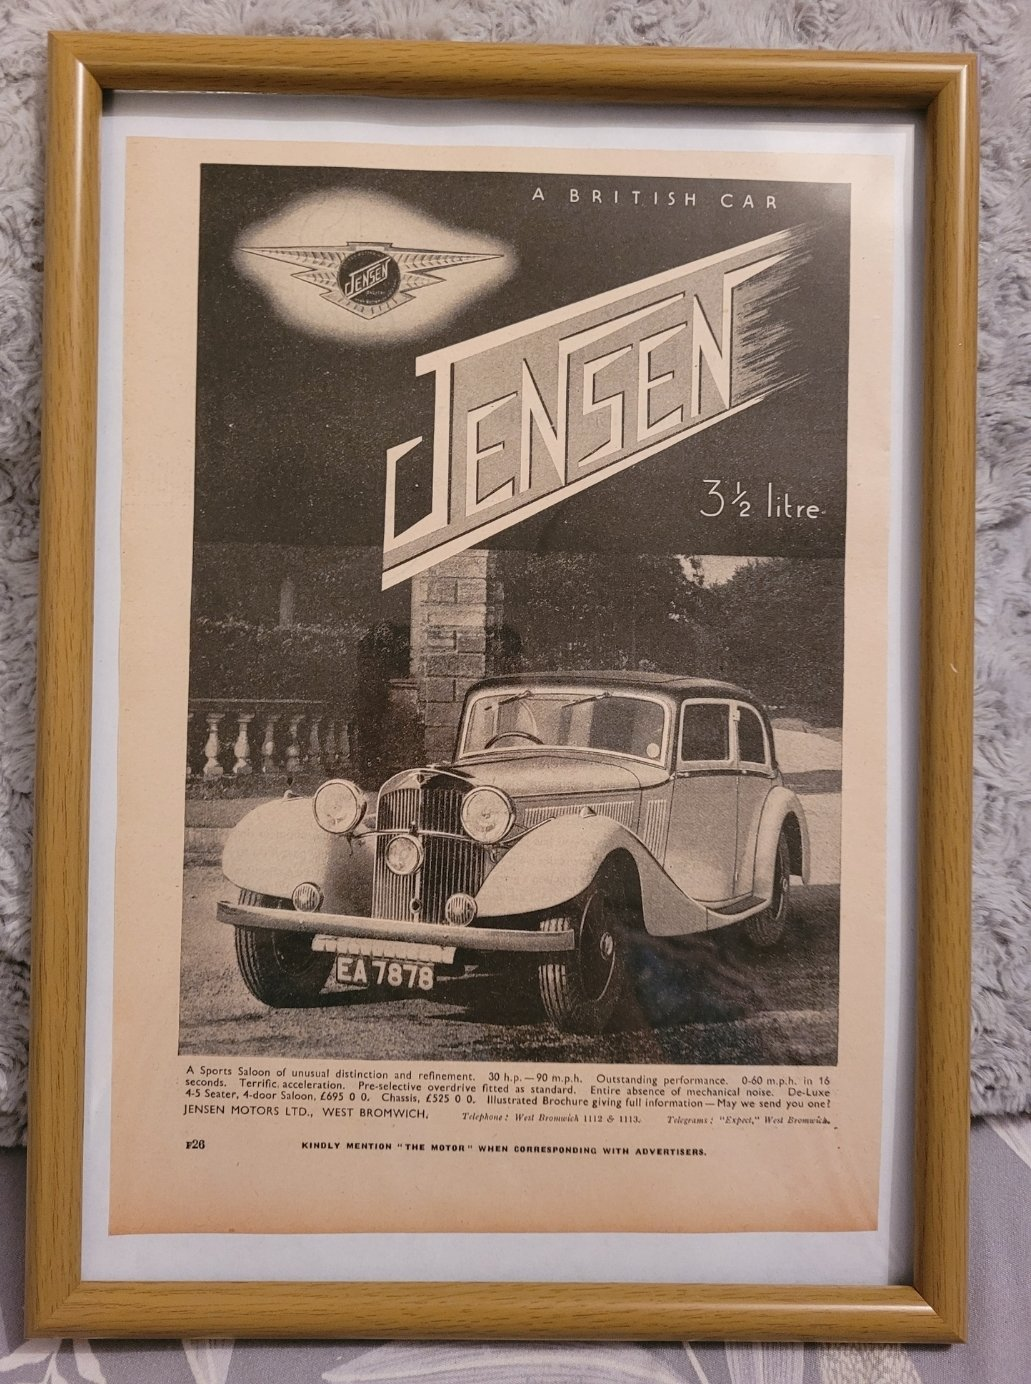 Original 1936 Jensen Framed Advert